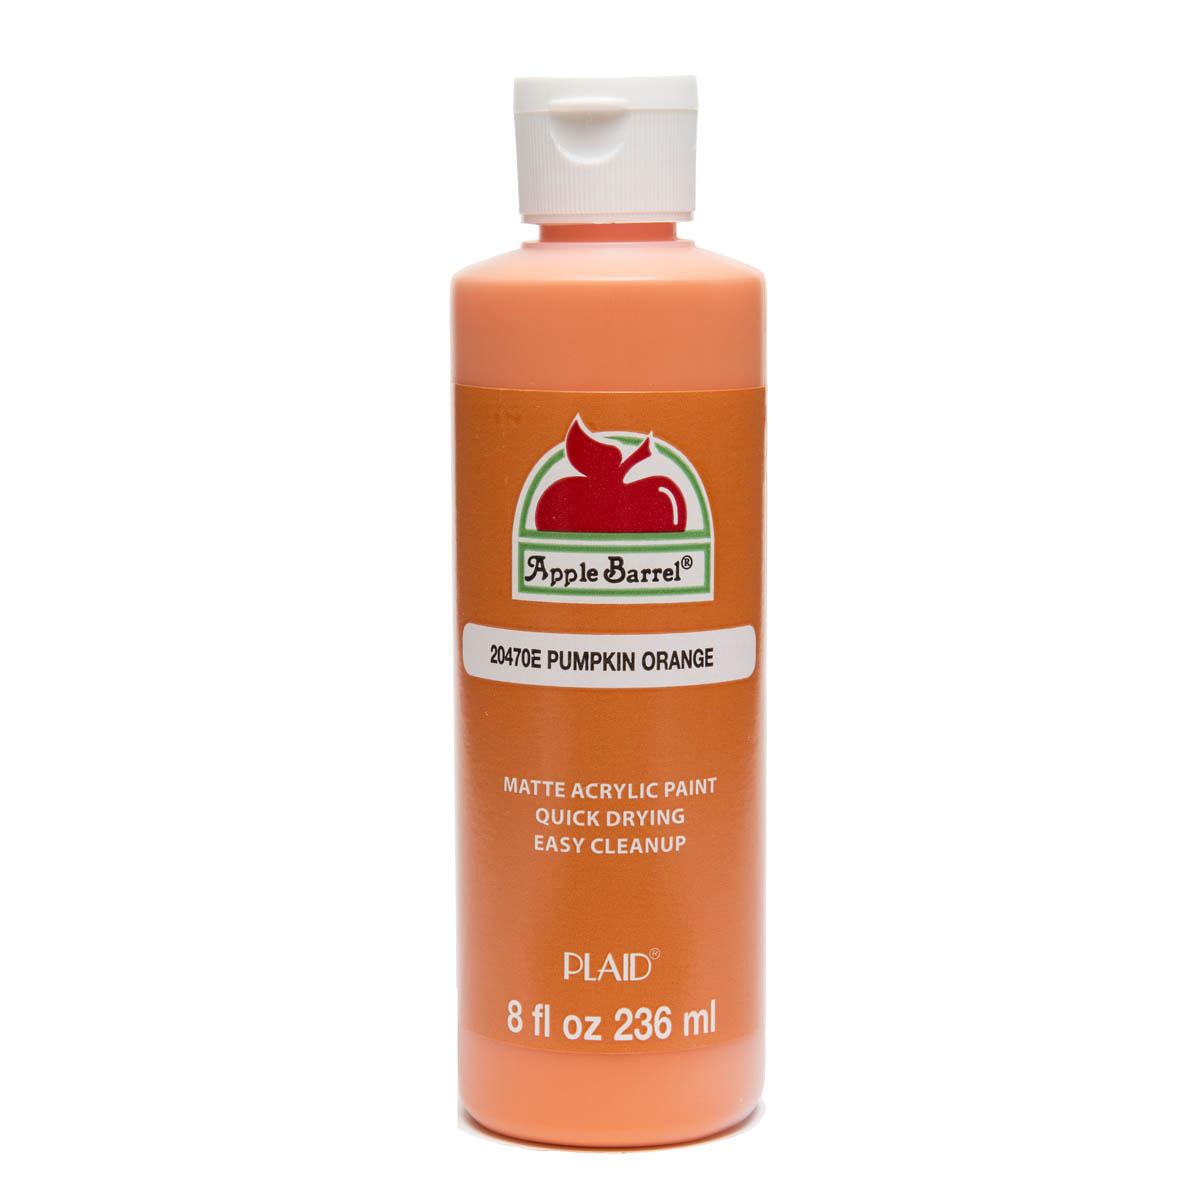 Apple Barrel ® Colors - Pumpkin Orange, 8 oz. - 20470